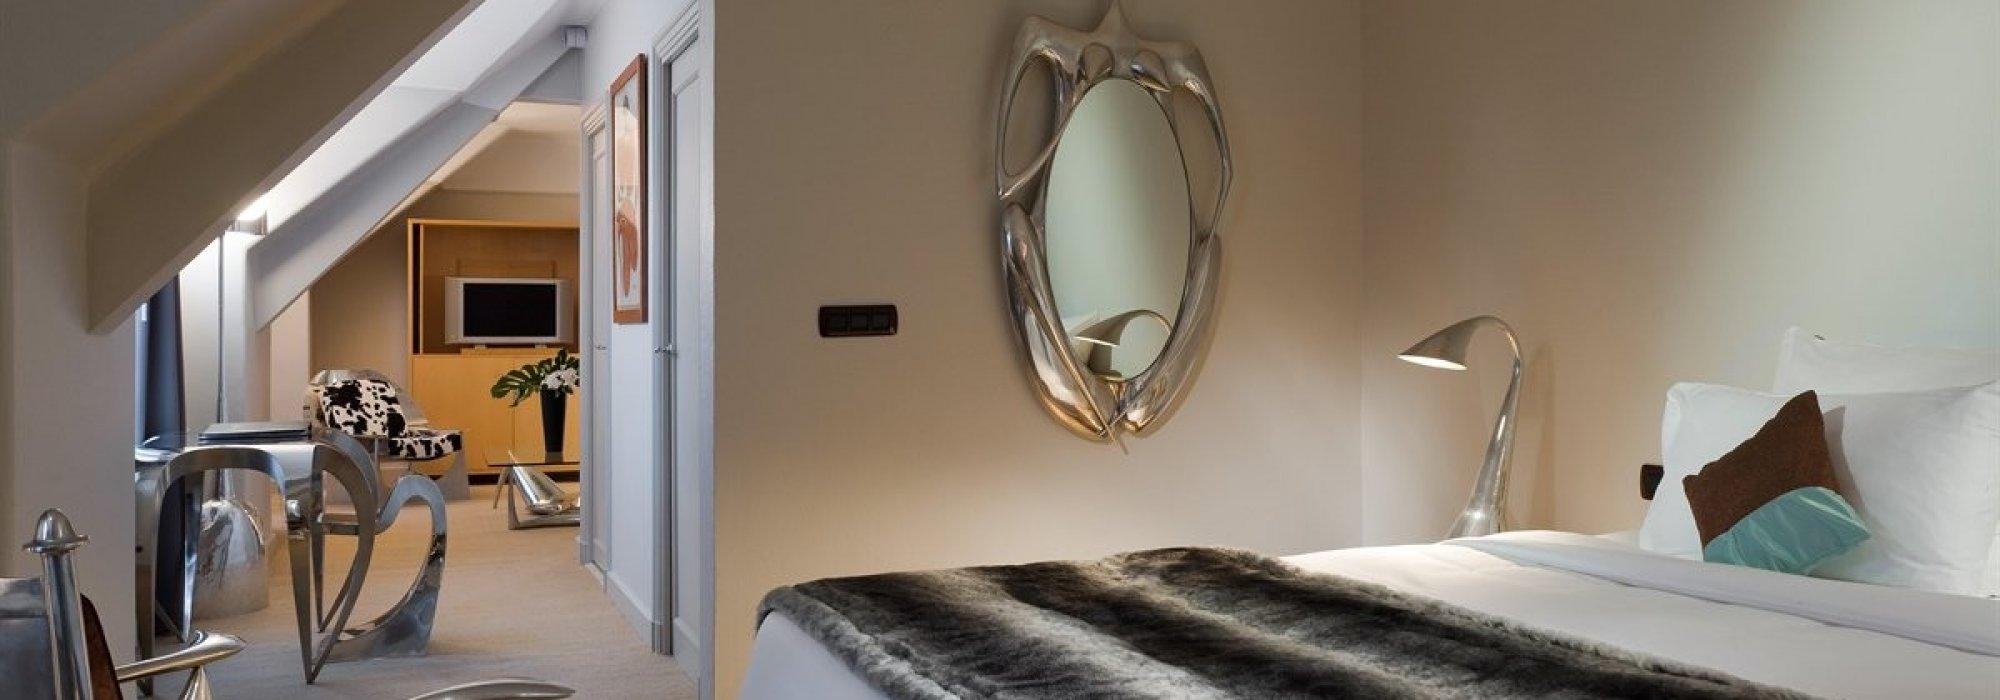 themust-hotel-luxe-lutetia-24